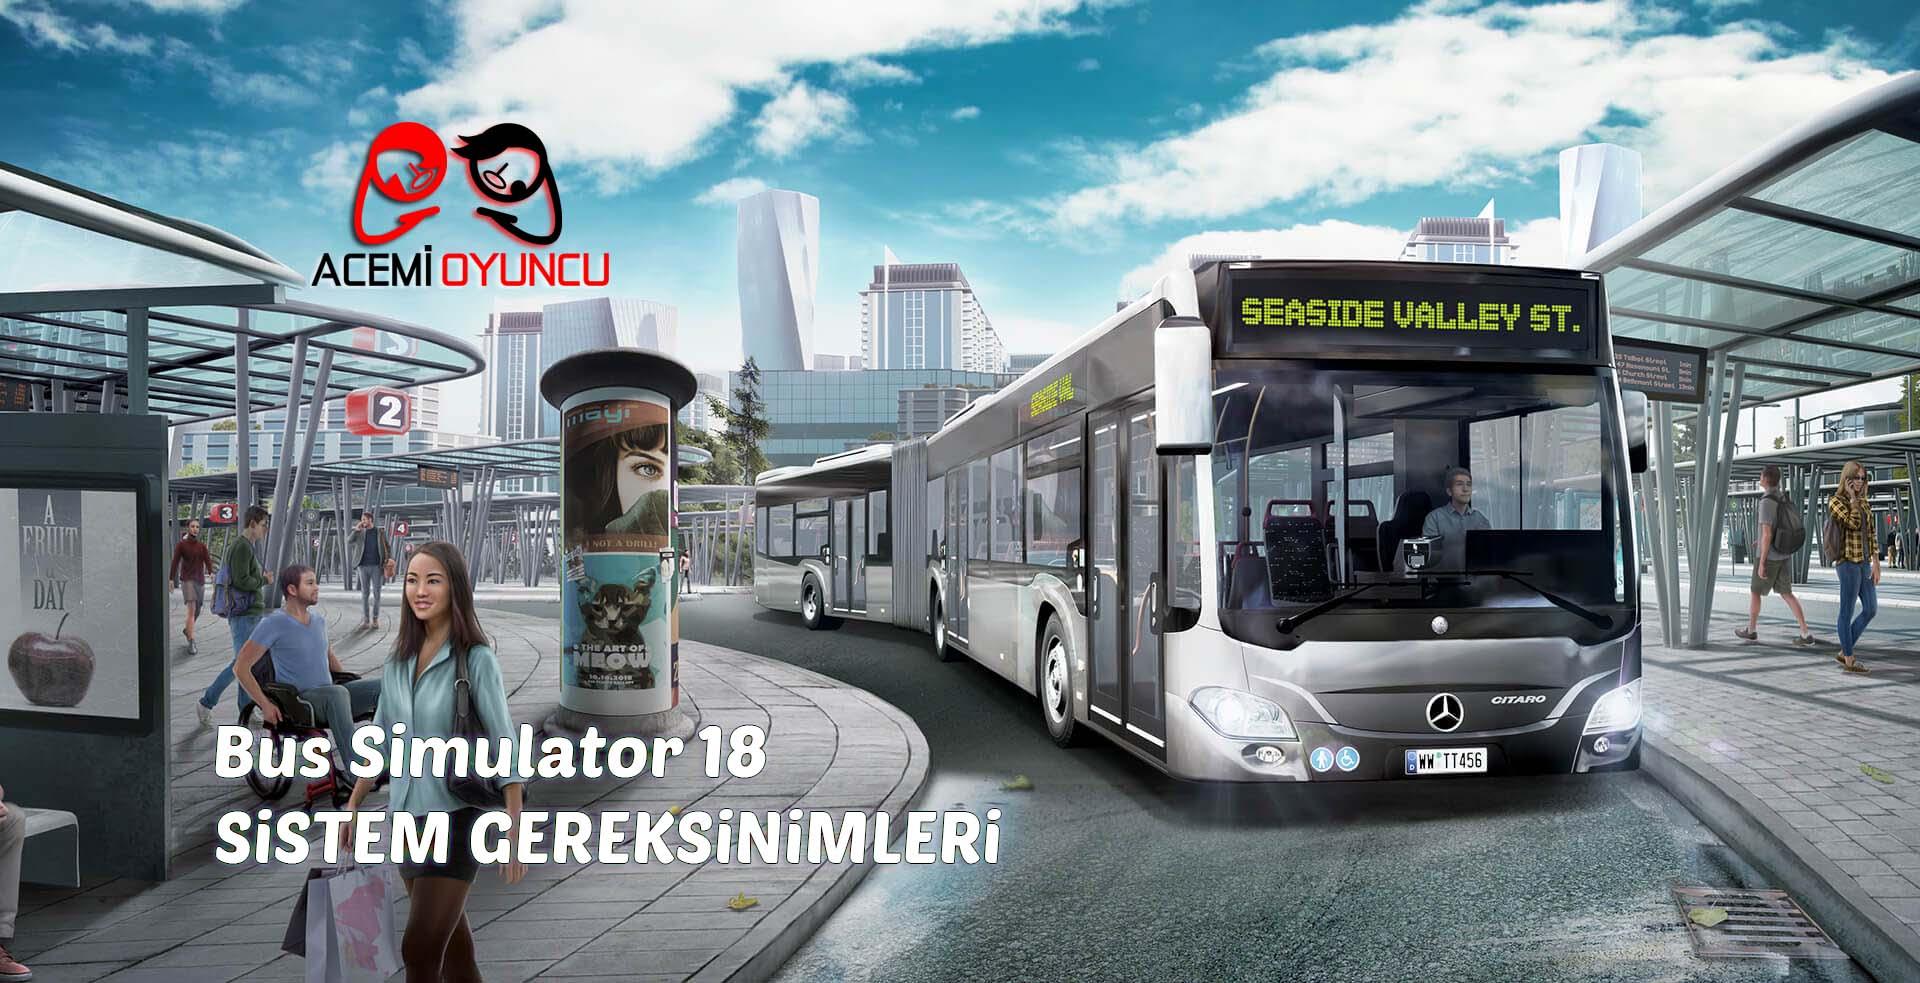 Bus Simulator 18 Sistem Gereksinimleri – Bus Simulator 18 Kaç GB ?